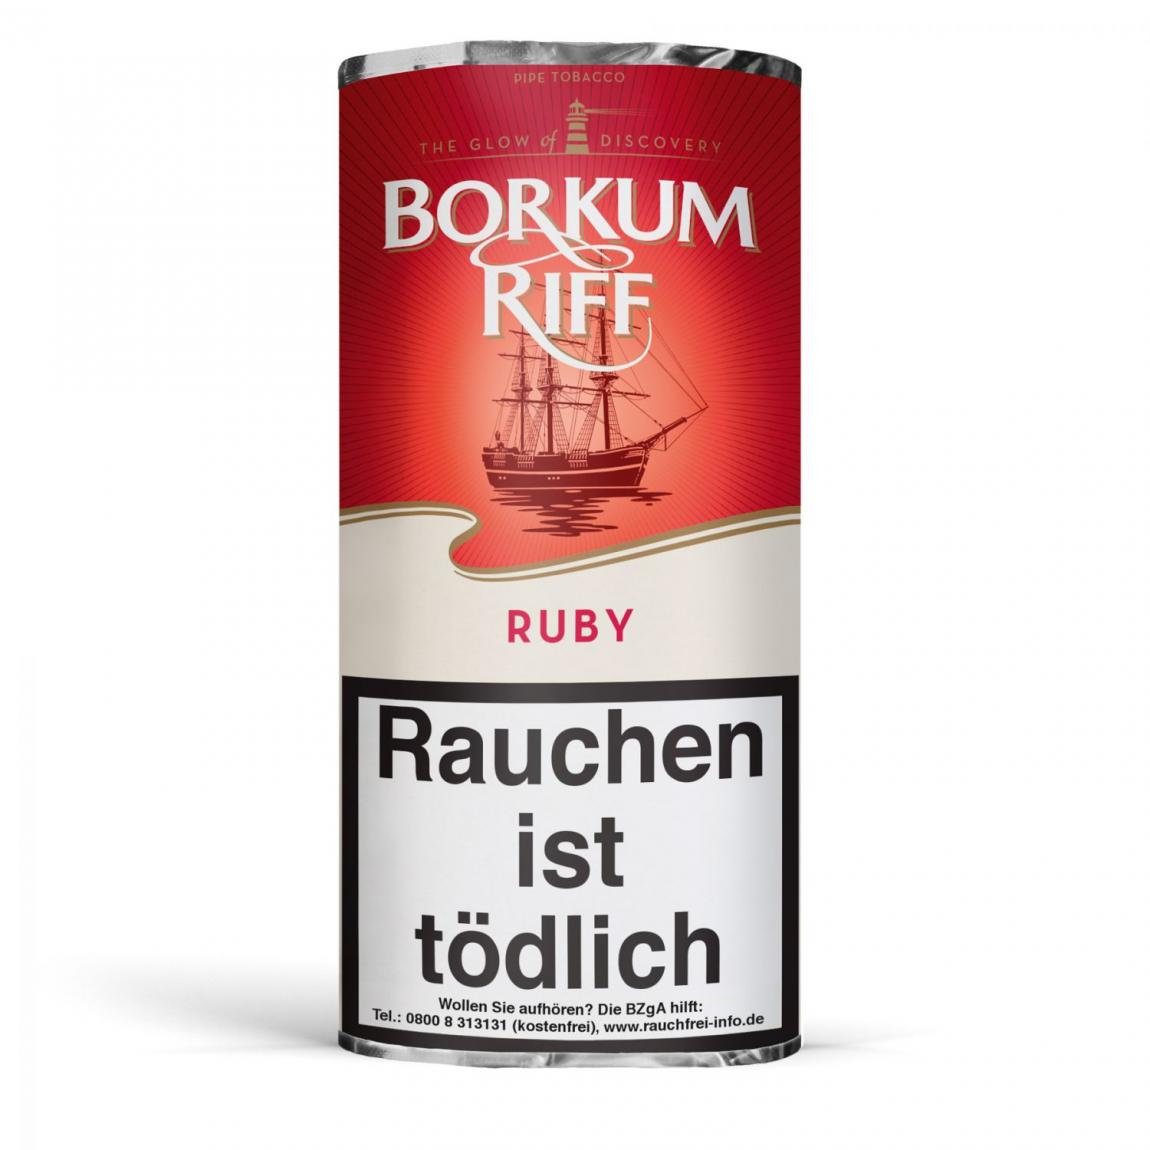 Borkum »Riff Ruby« 50g Pouch